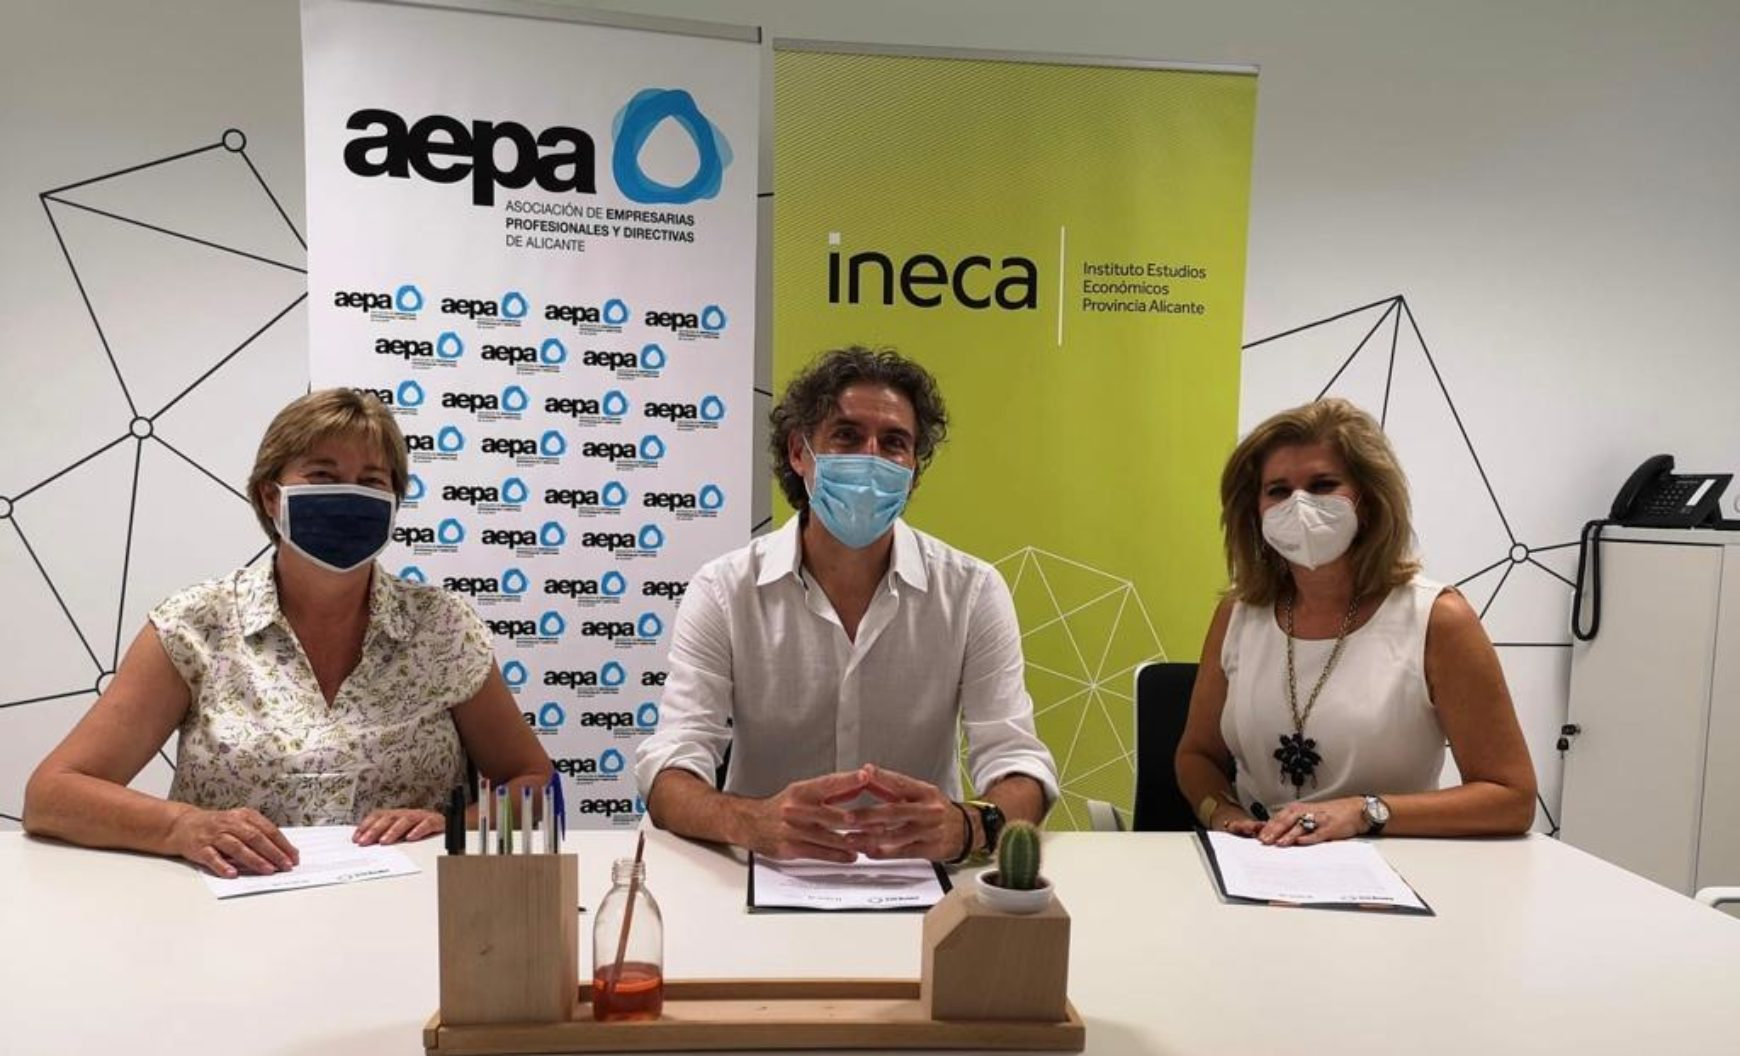 AEPA e INECA firman un convenio e intercambiarán información para impulsar los estudios